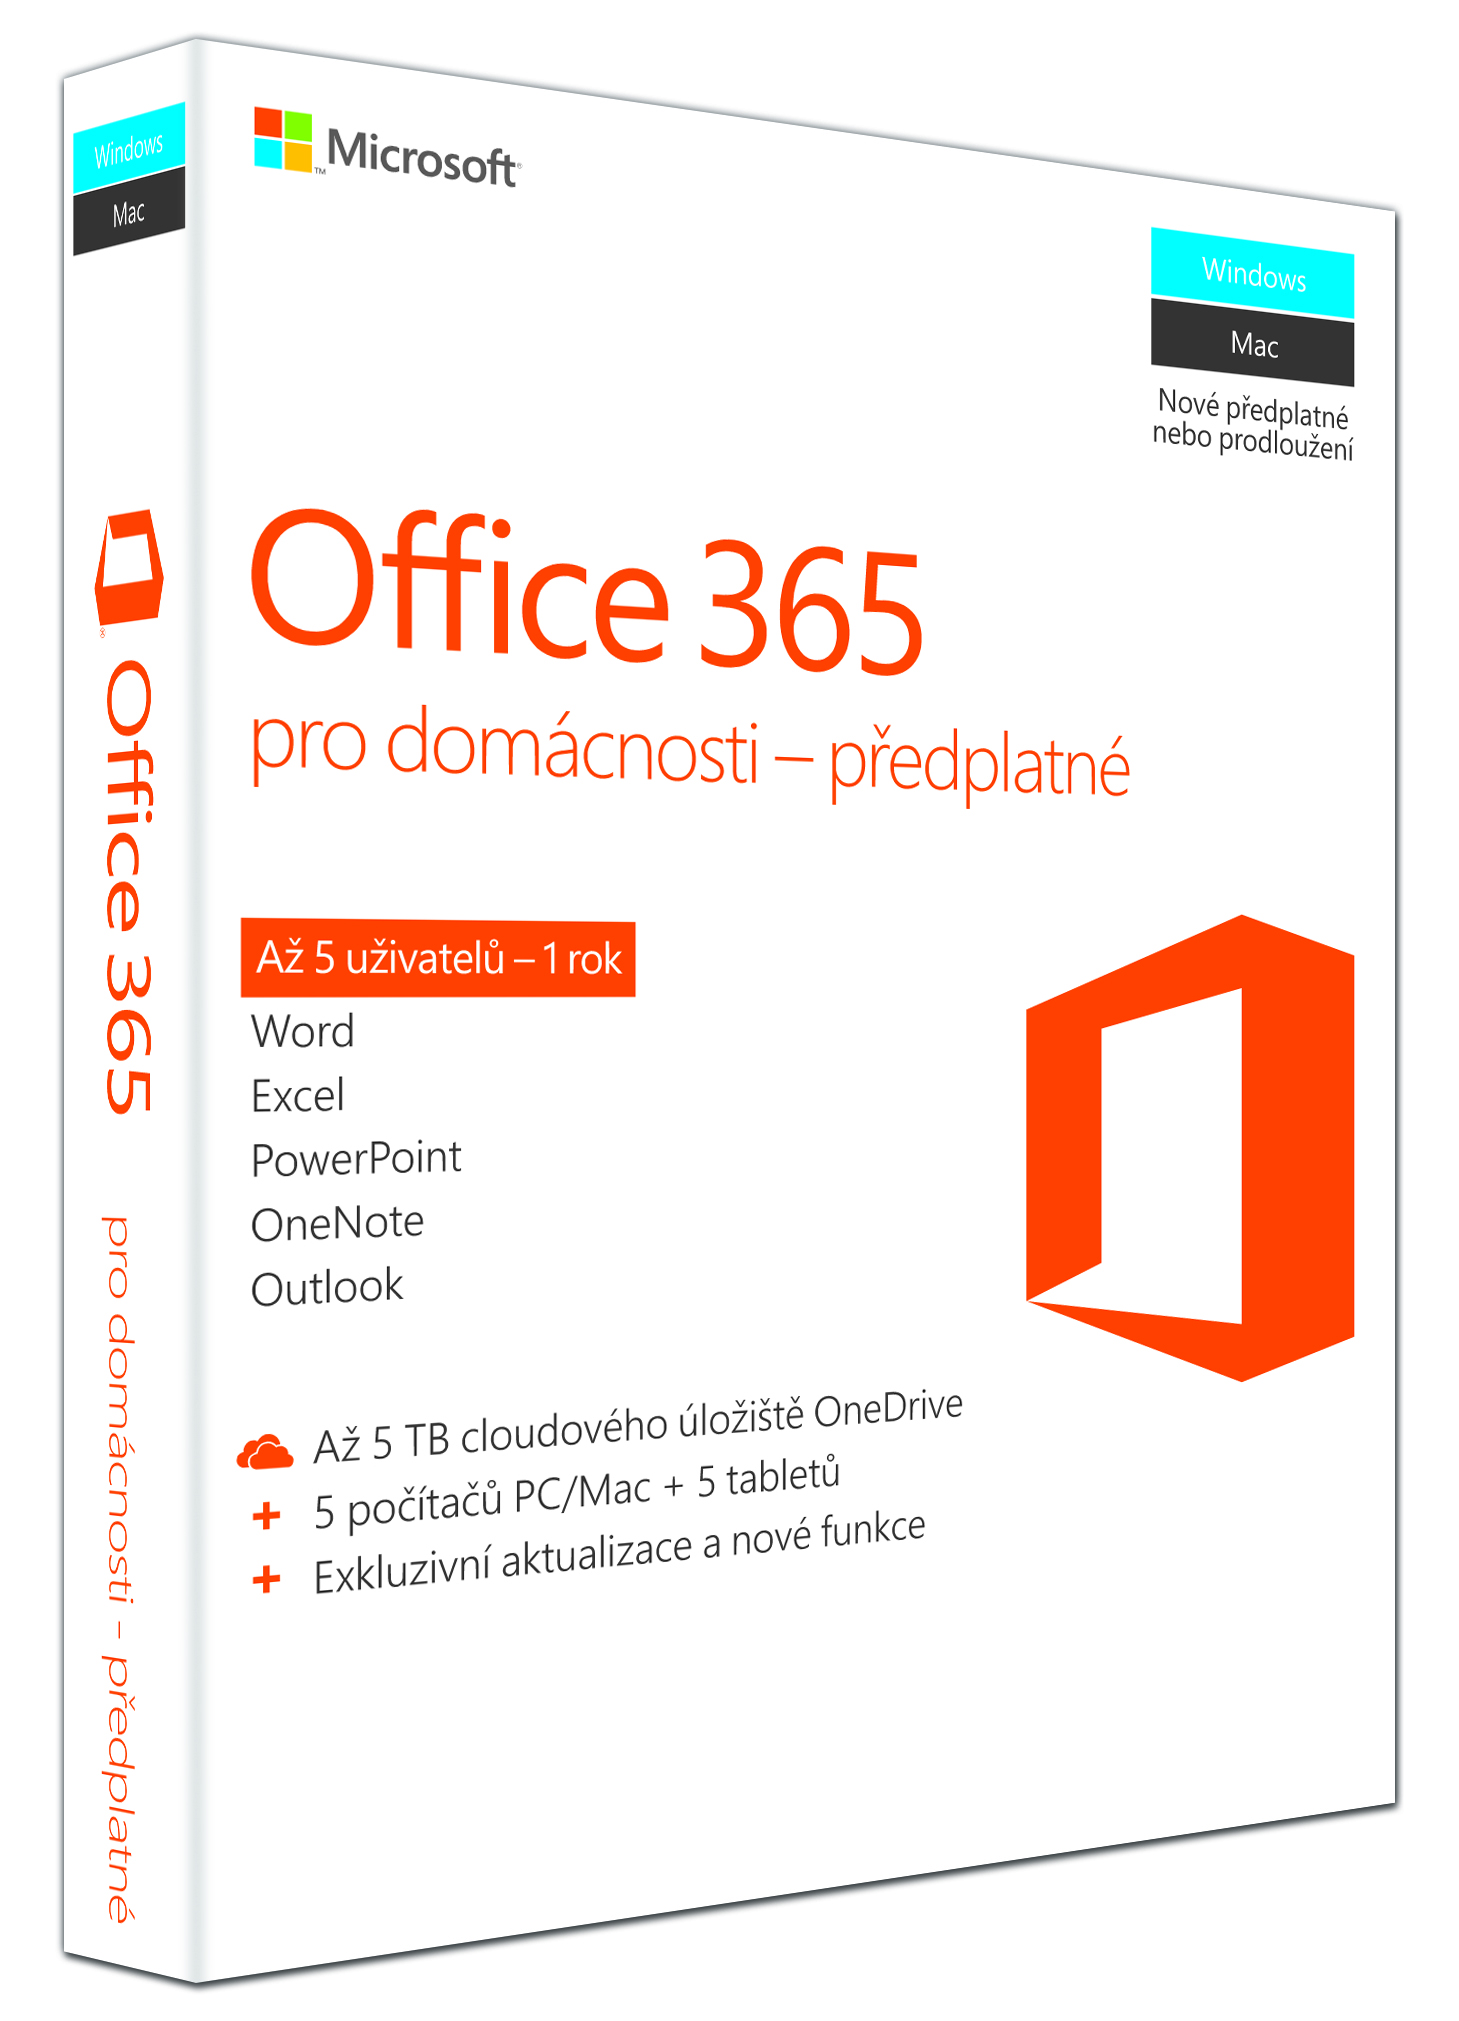 Office 365 Home 32-bit/x64 Eng pronájem, P2